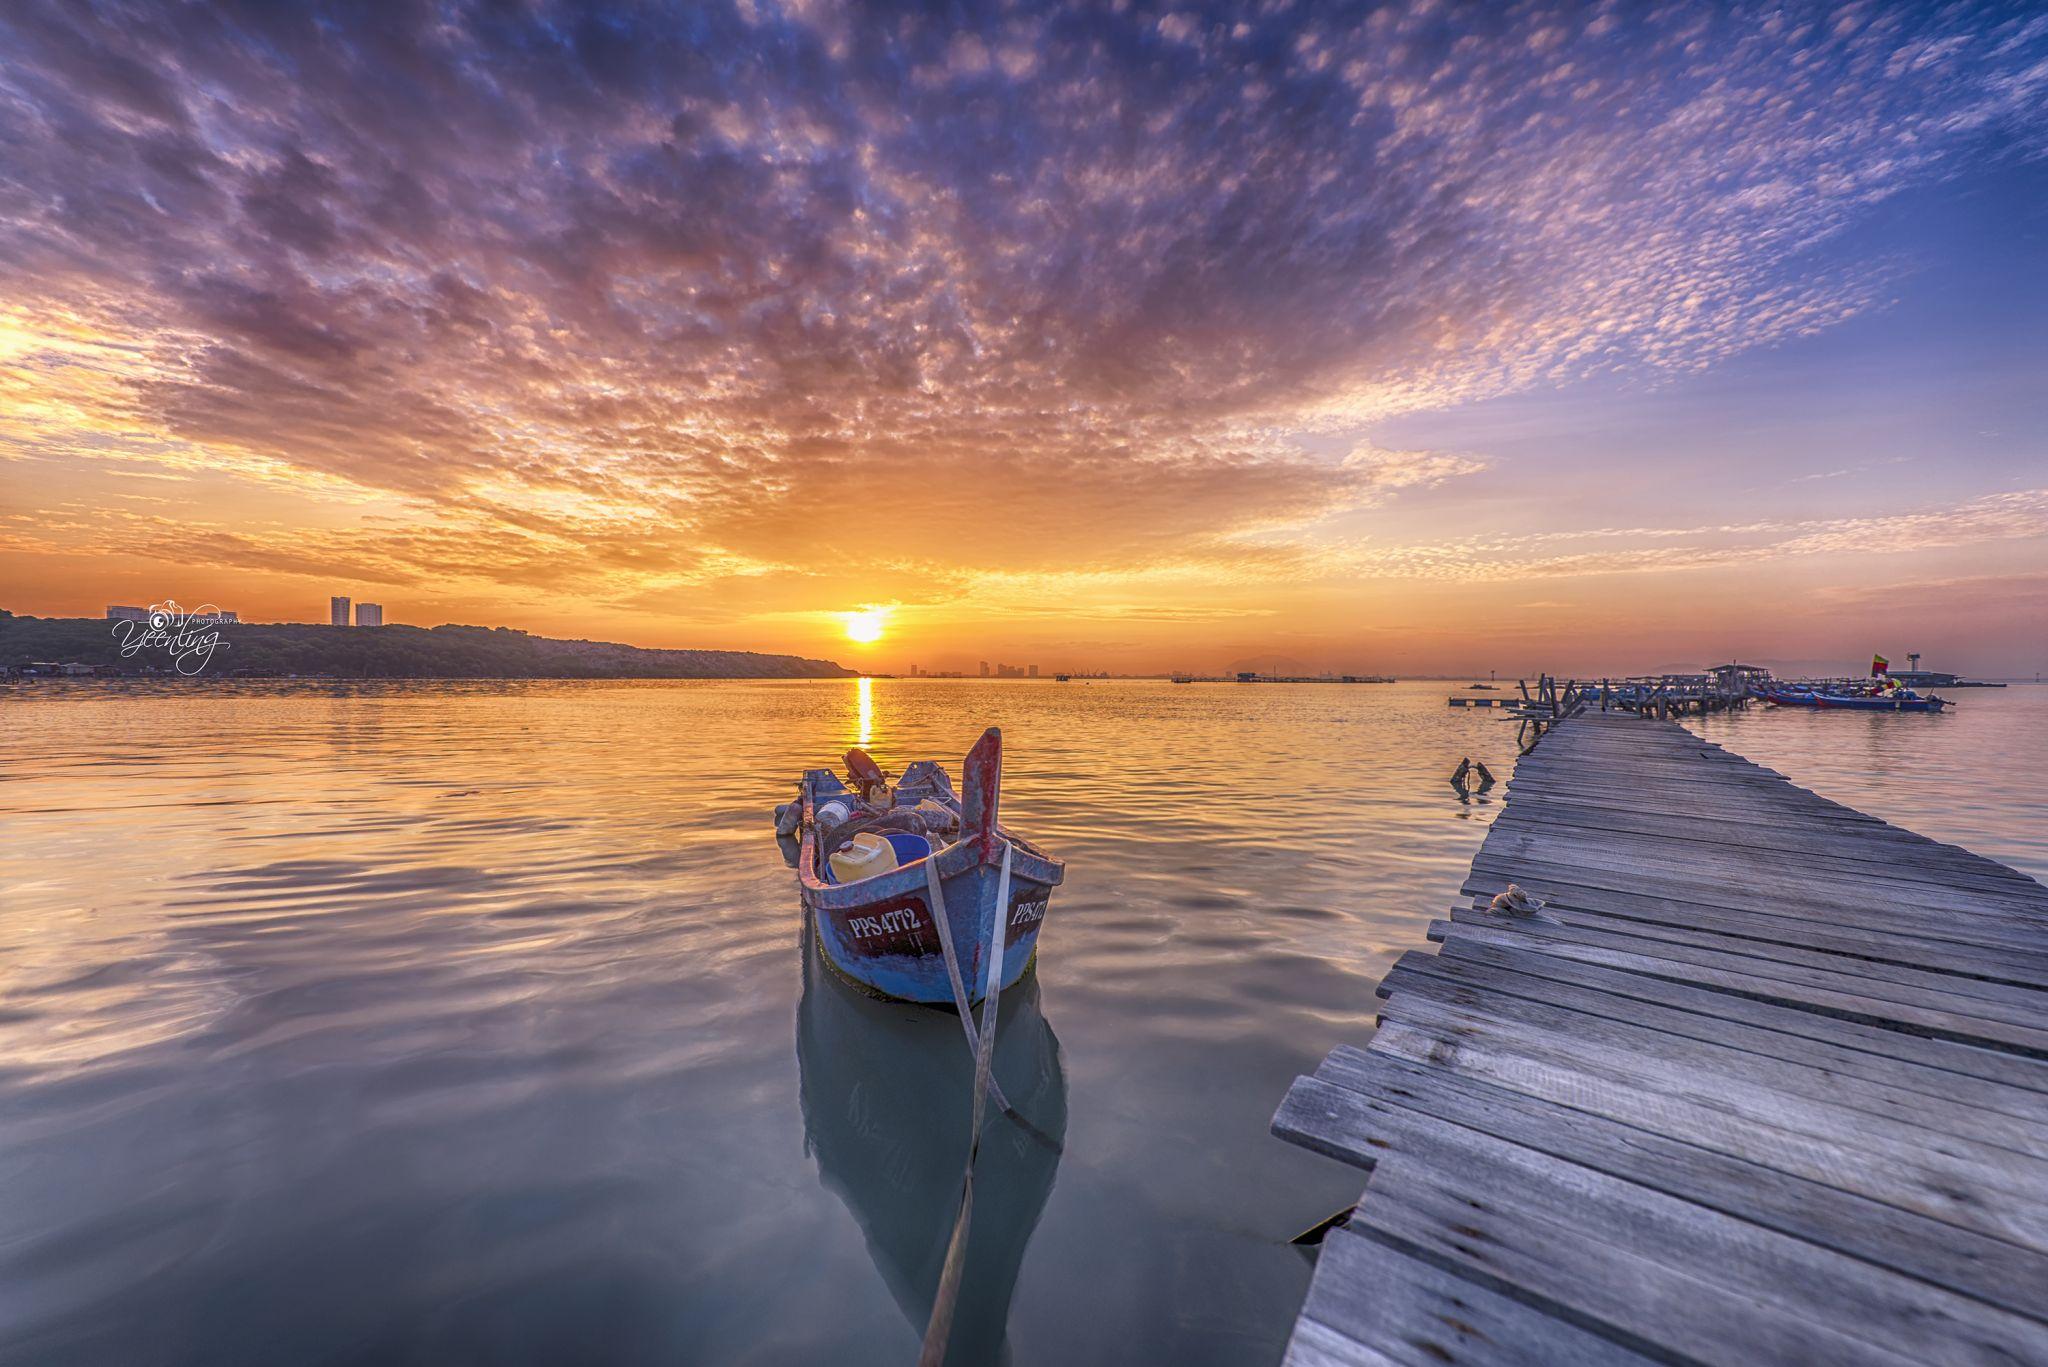 Sunrise over Dove Jetty, Malaysia